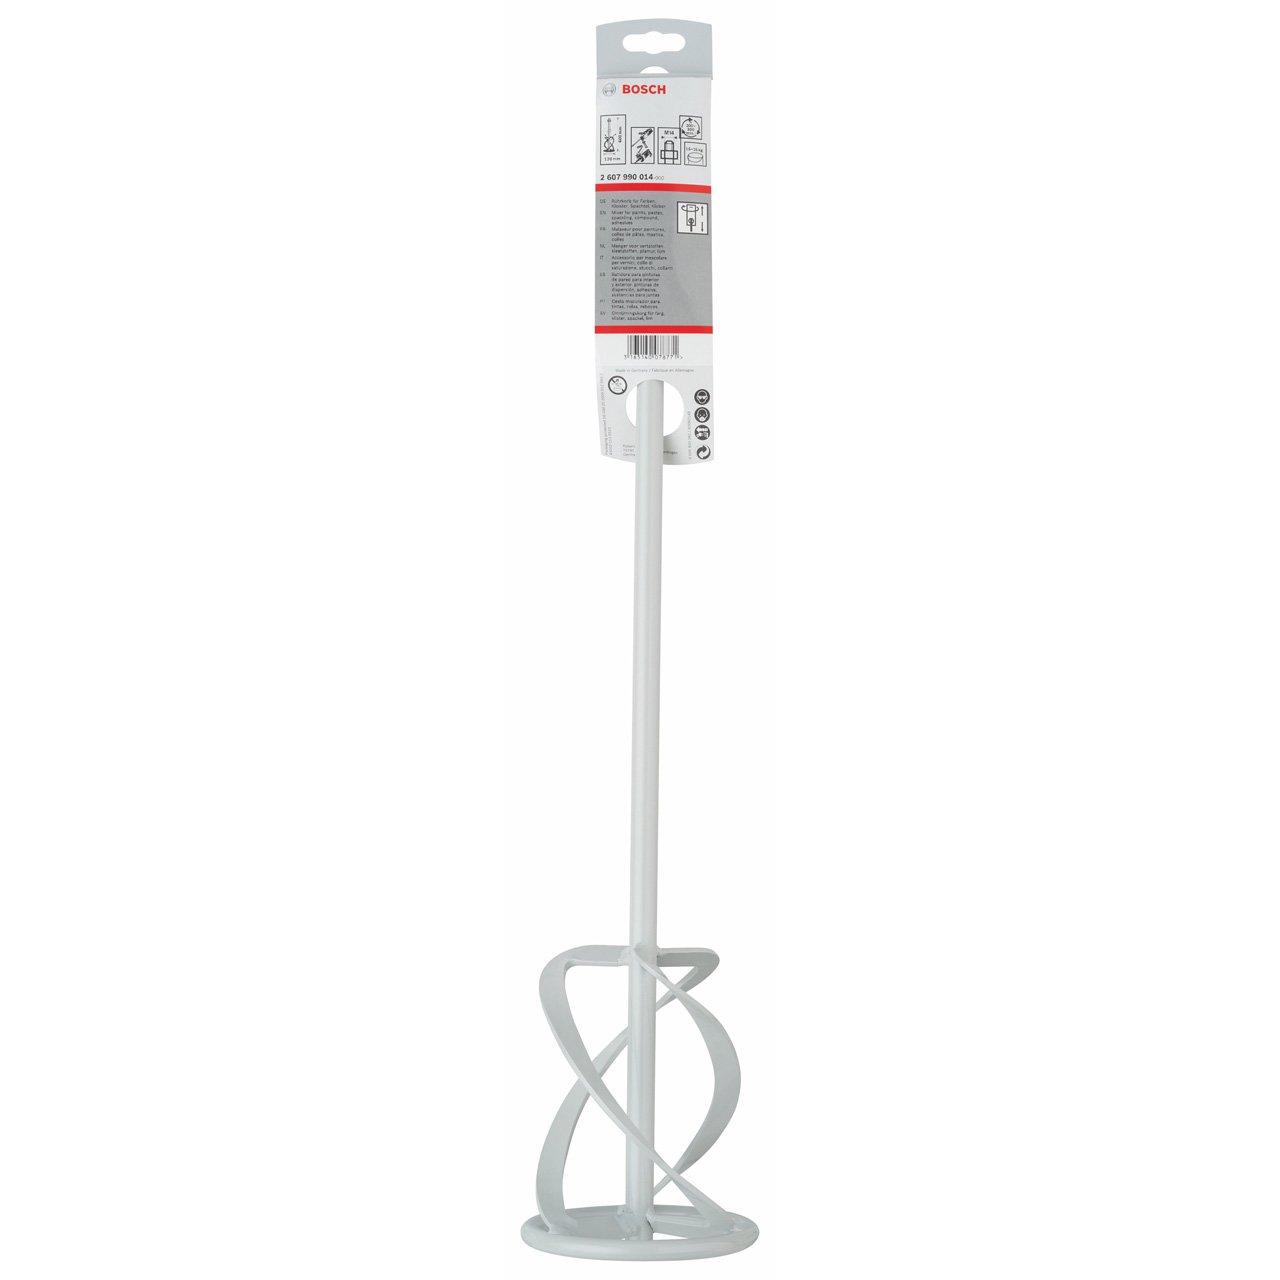 Bosch Zubehö r 2607990022 Rü hrkorb 140 mm, 600 mm, 25-40 kg